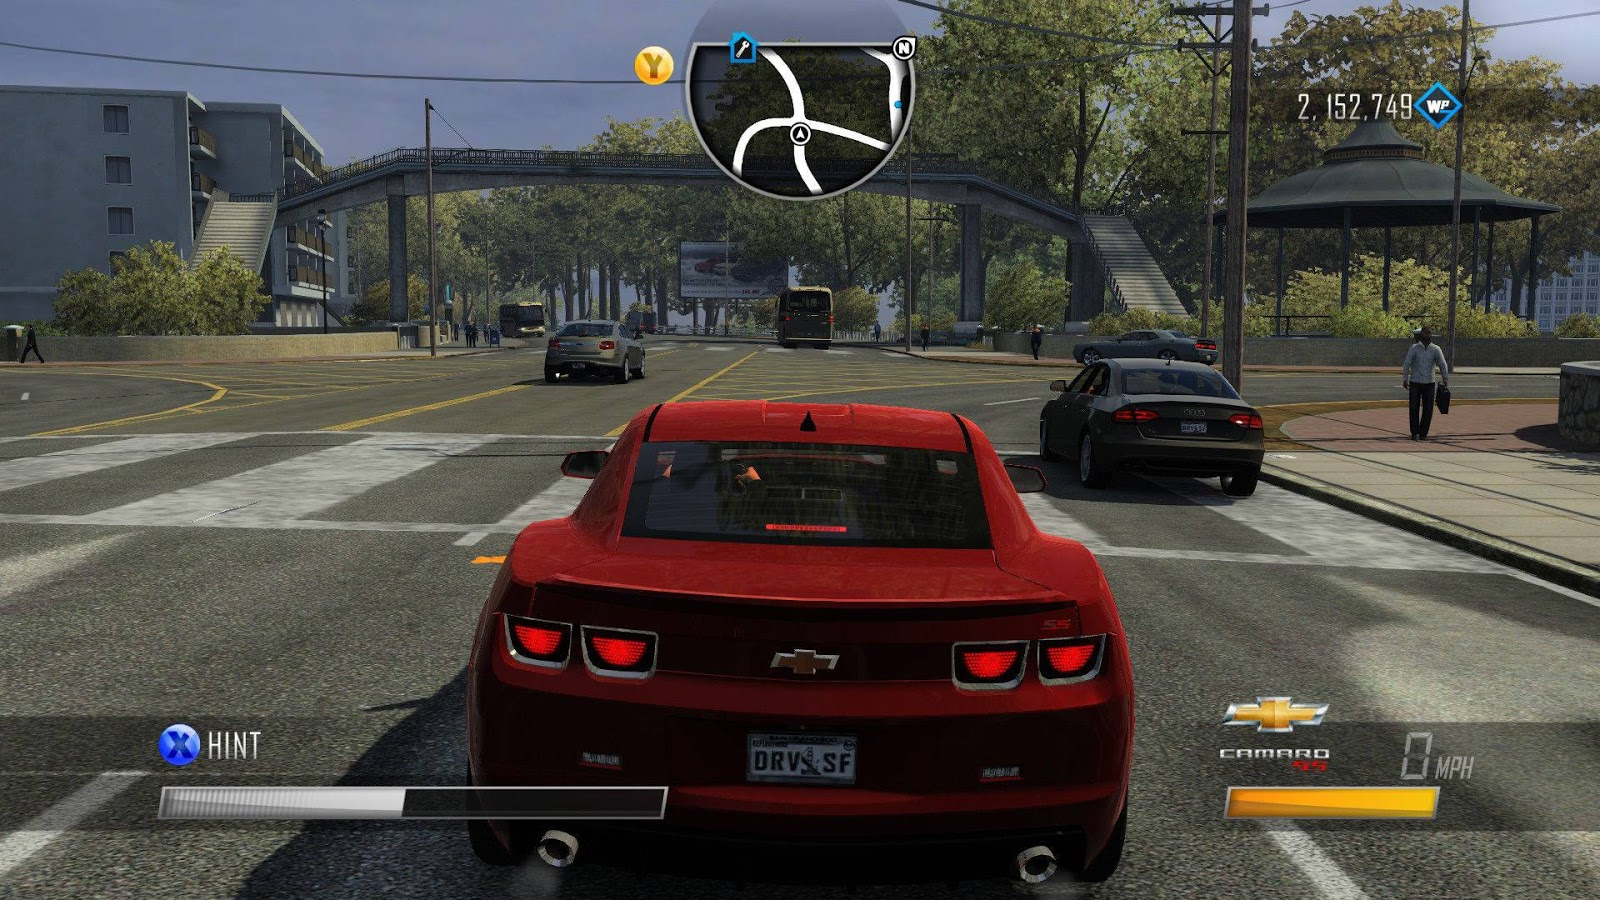 داگرتنی یاری Driver: San Francisco PC Game بۆ كۆمپیوتهر